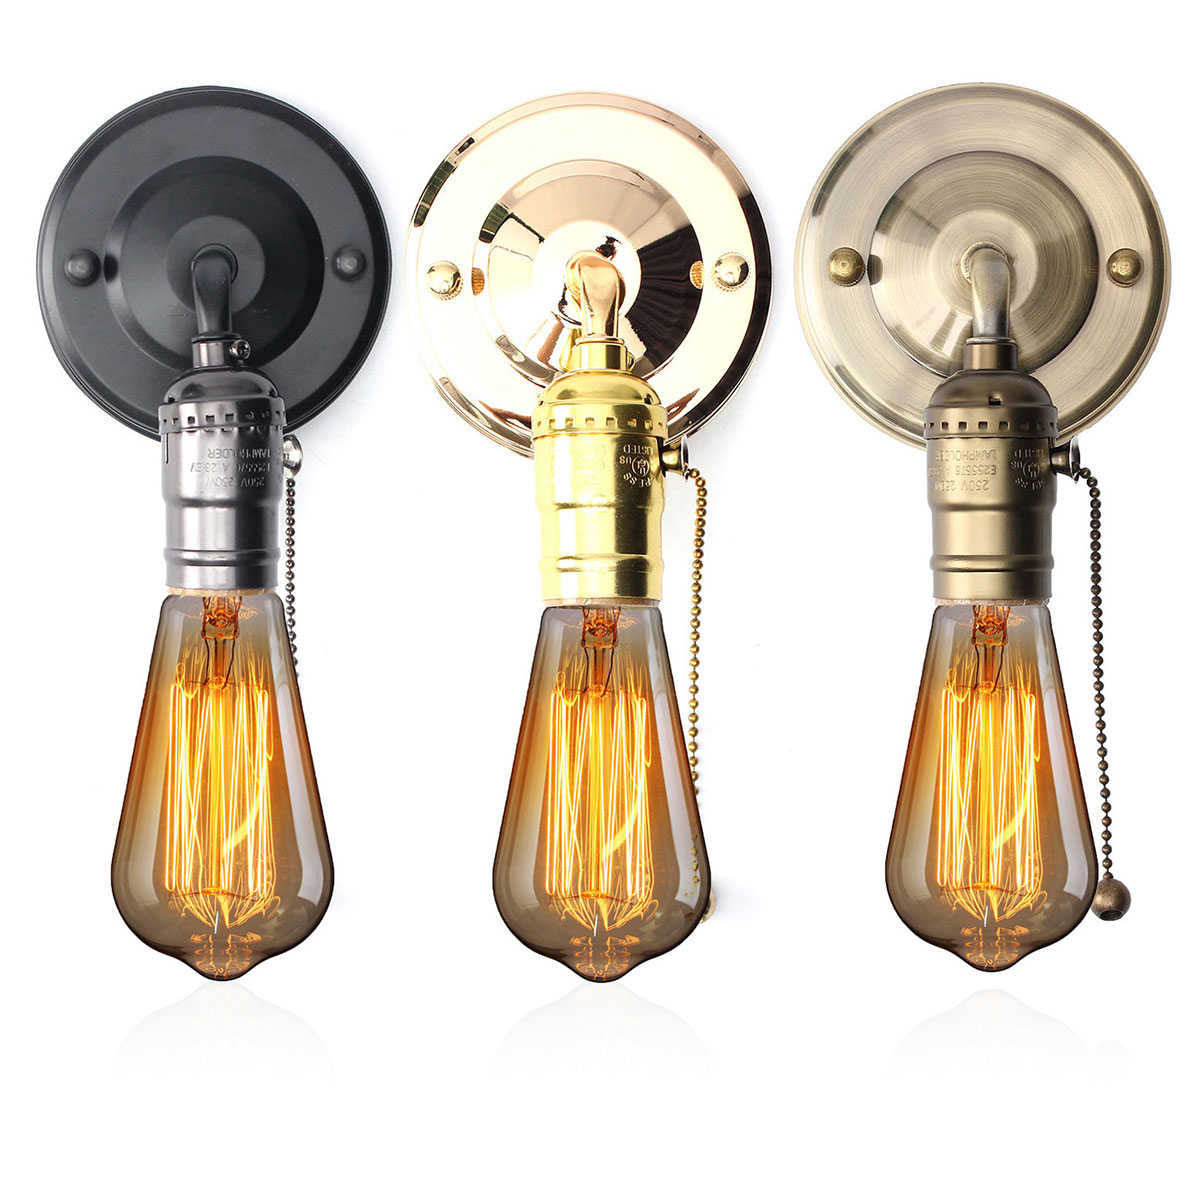 Wall Light Lamp Design: E27 Antique Vintage Wall Light Chain Design Sconce Lamp